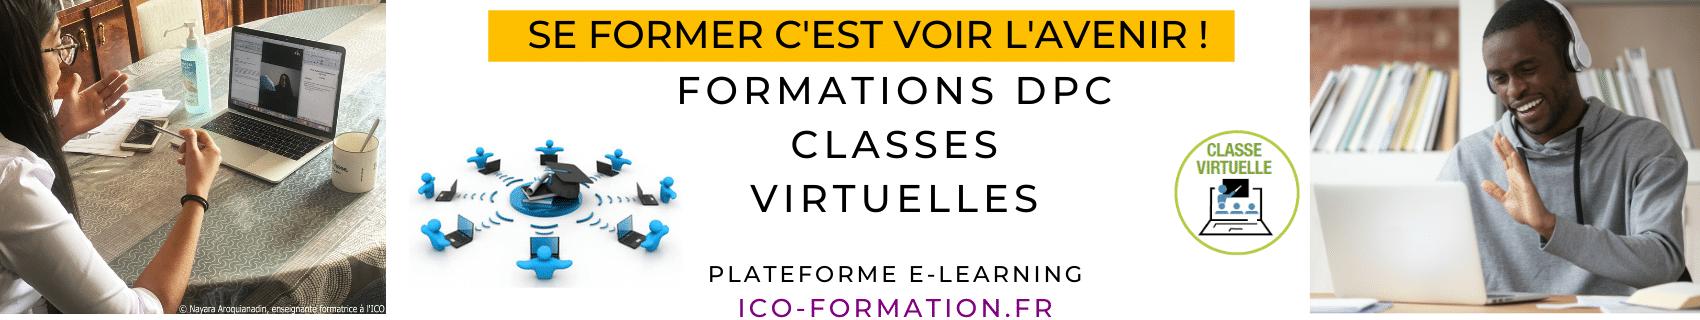 formations optiques à distance, classes virtuelles, e-learning, ICO